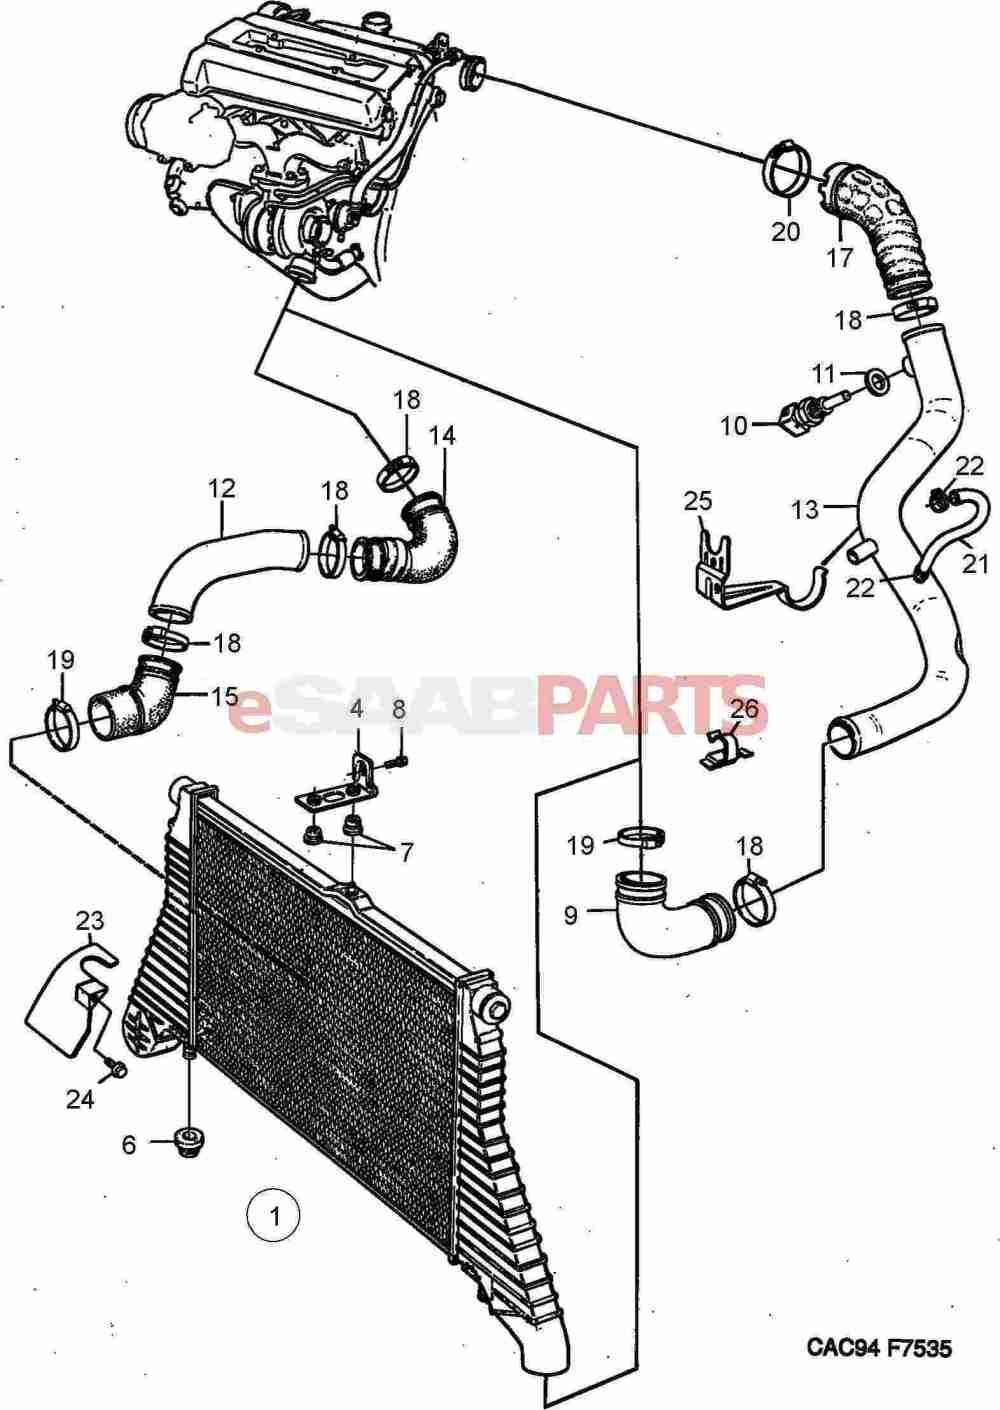 medium resolution of 1987 ford ranger fuse diagram another blog about wiring diagram u2022 rh ok2 infoservice ru 1987